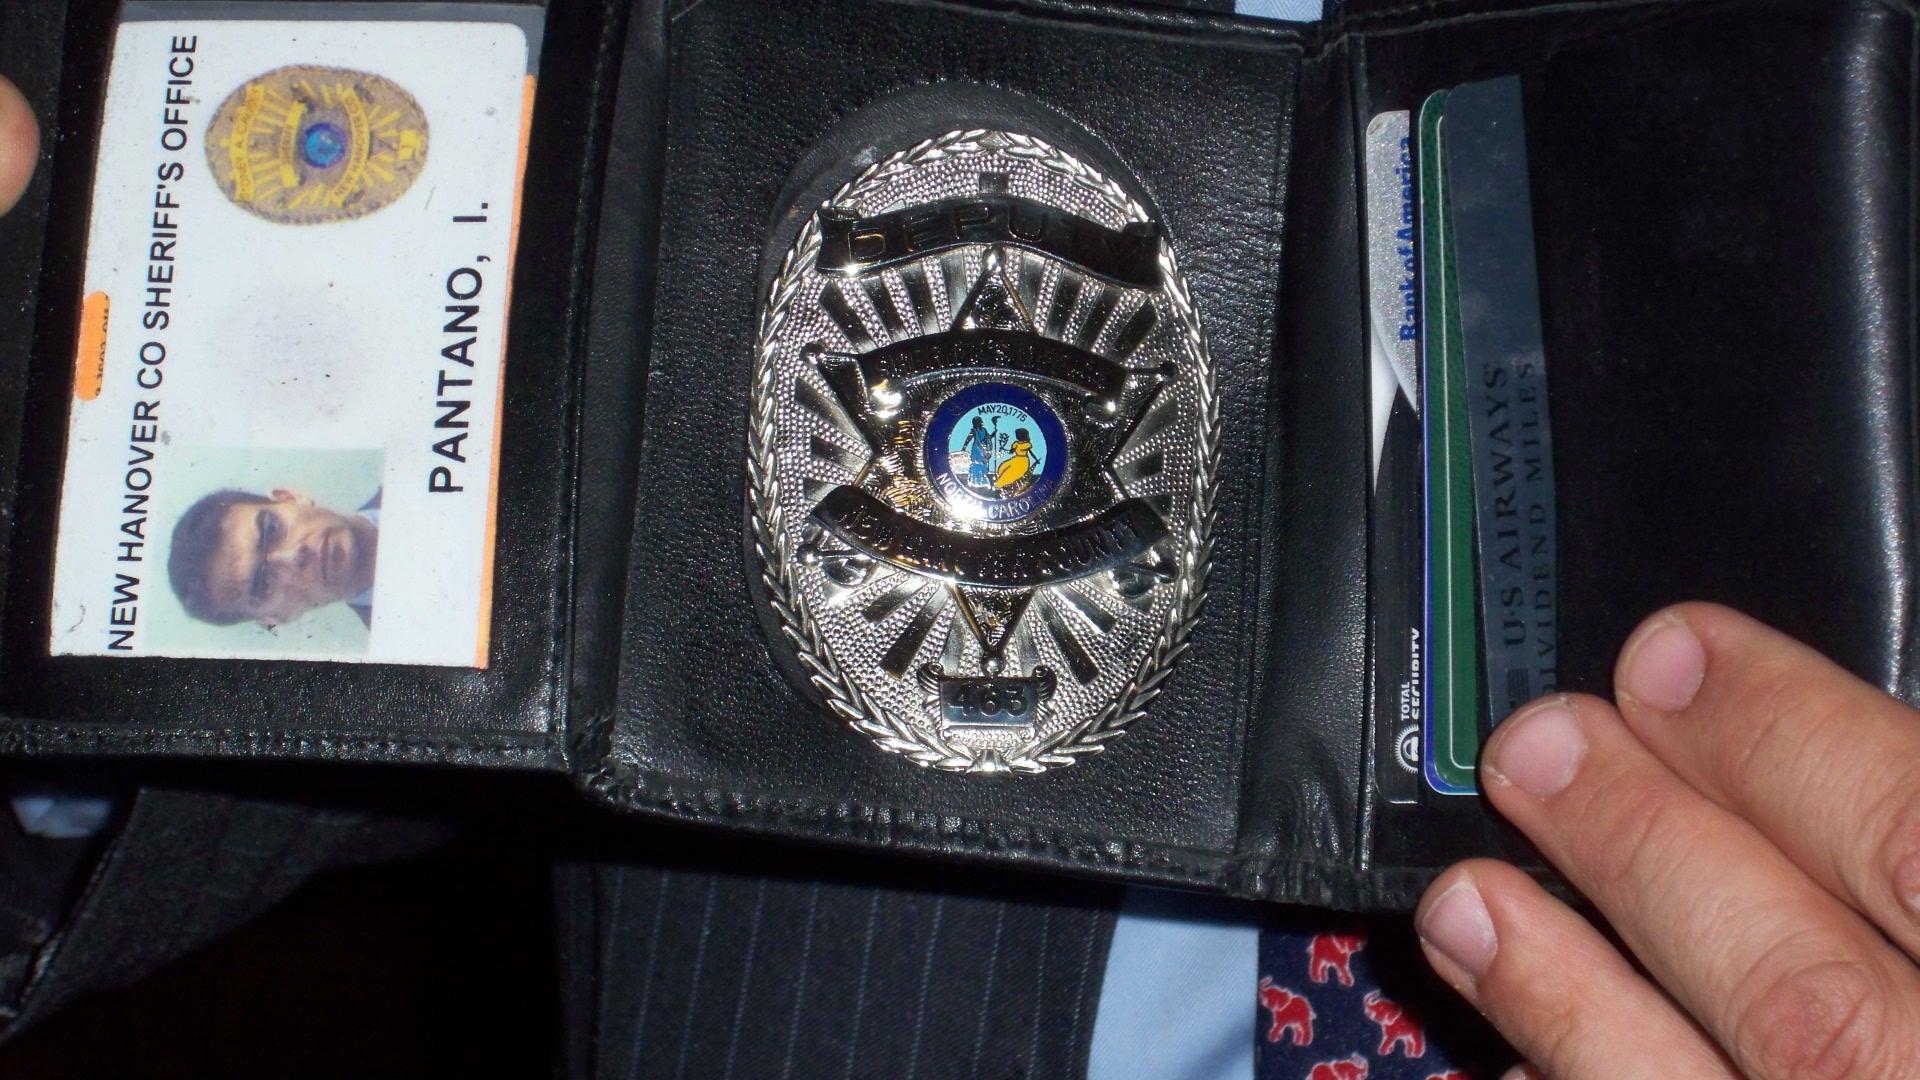 Law Enforcement Badge Wallpaper Sheriff deputy badge 1920x1080